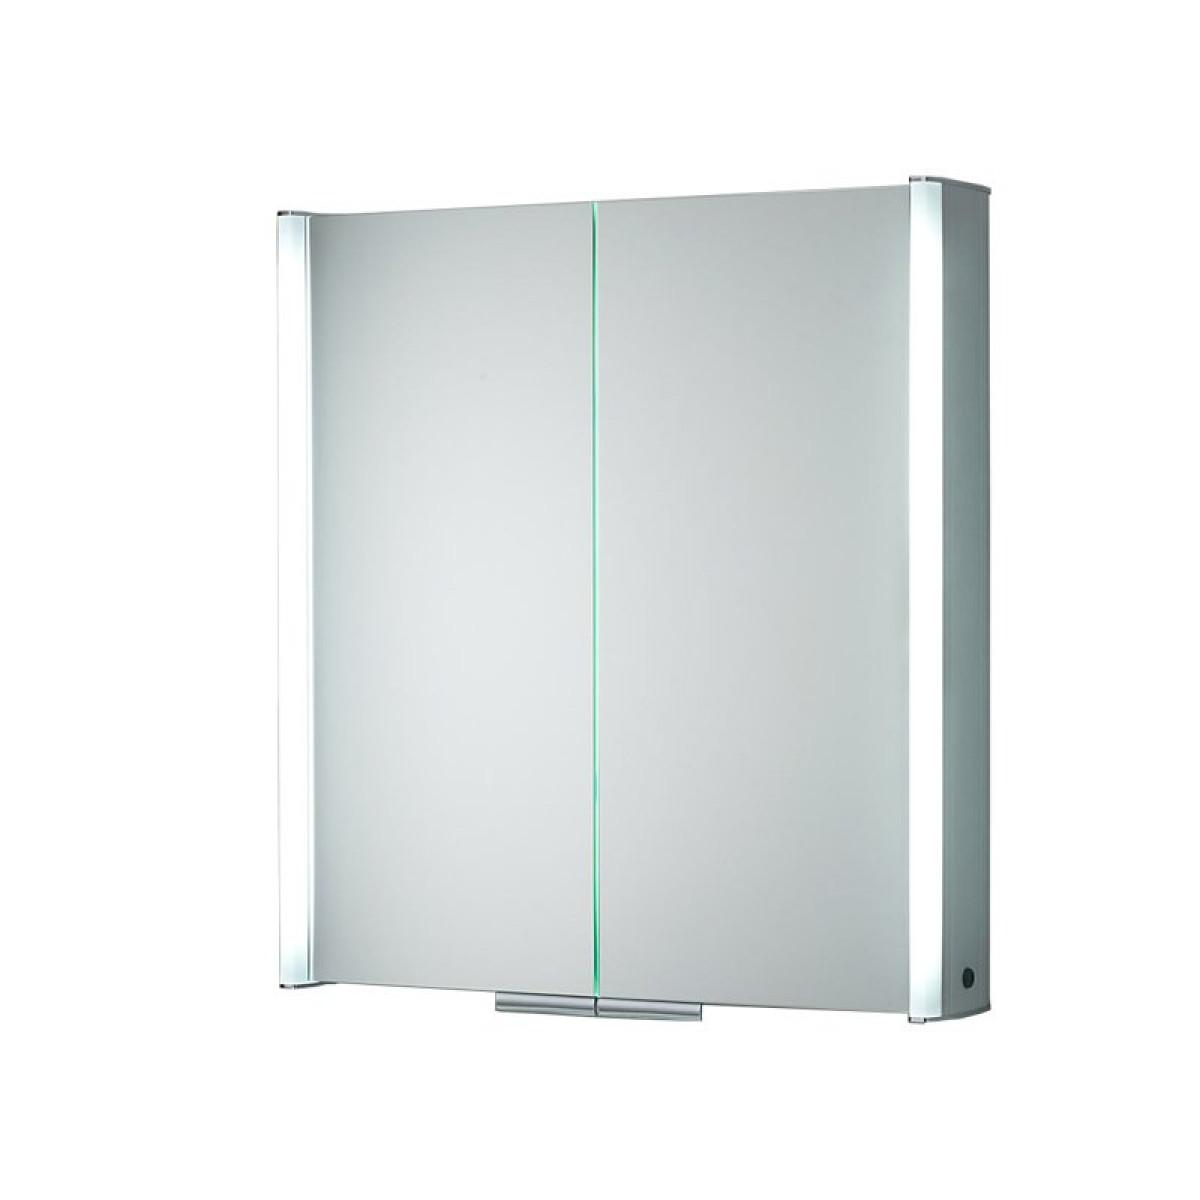 HIB Xenon 80 LED Aluminium Illuminated Bathroom Cabinet